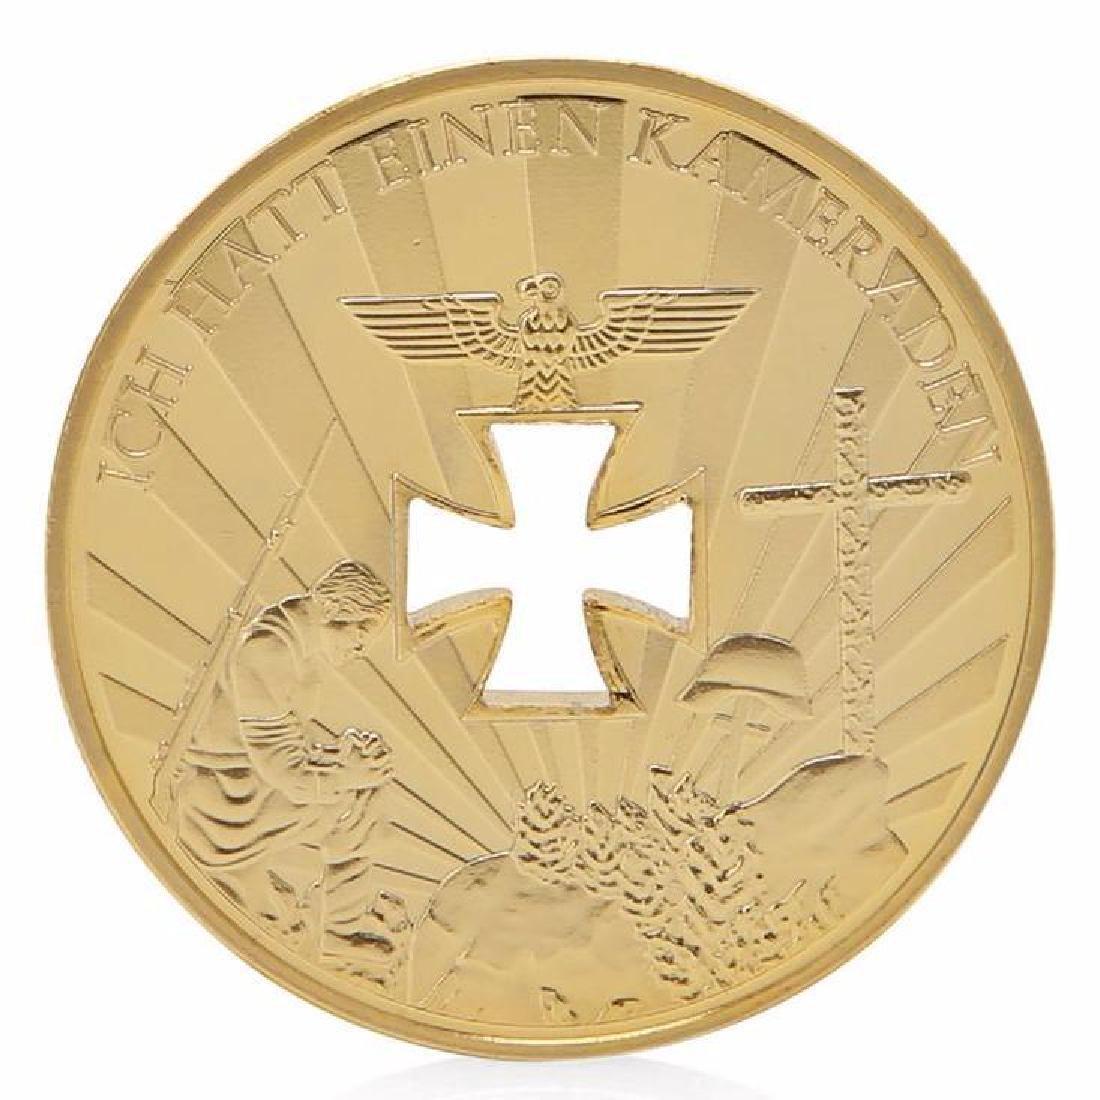 World War I & II Gold Clad Commemoration Coin